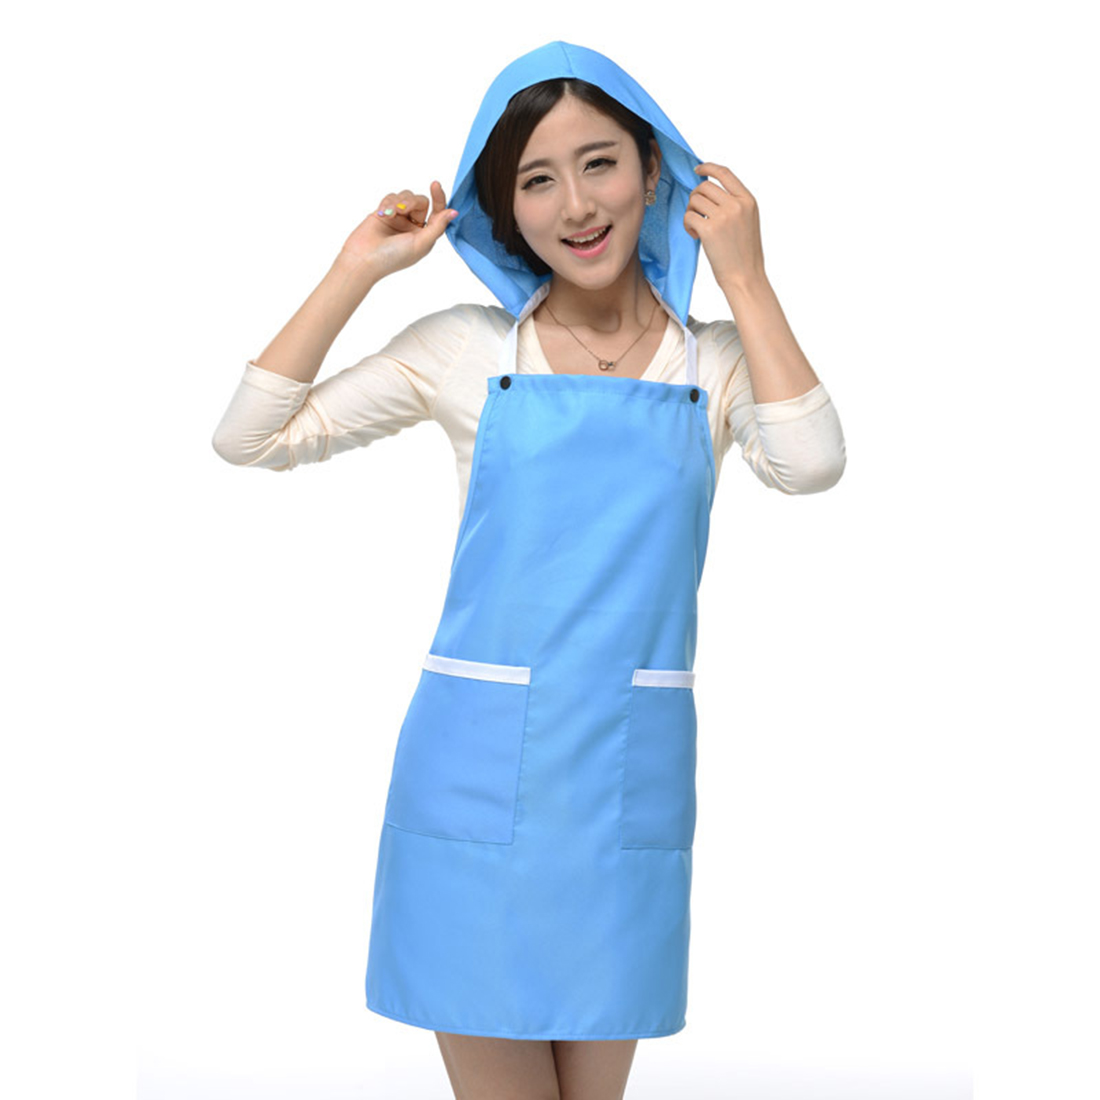 Women Kitchen Restaurant Cafe Cooking Dress Pocket Apron Bib Sky Blue w Cap